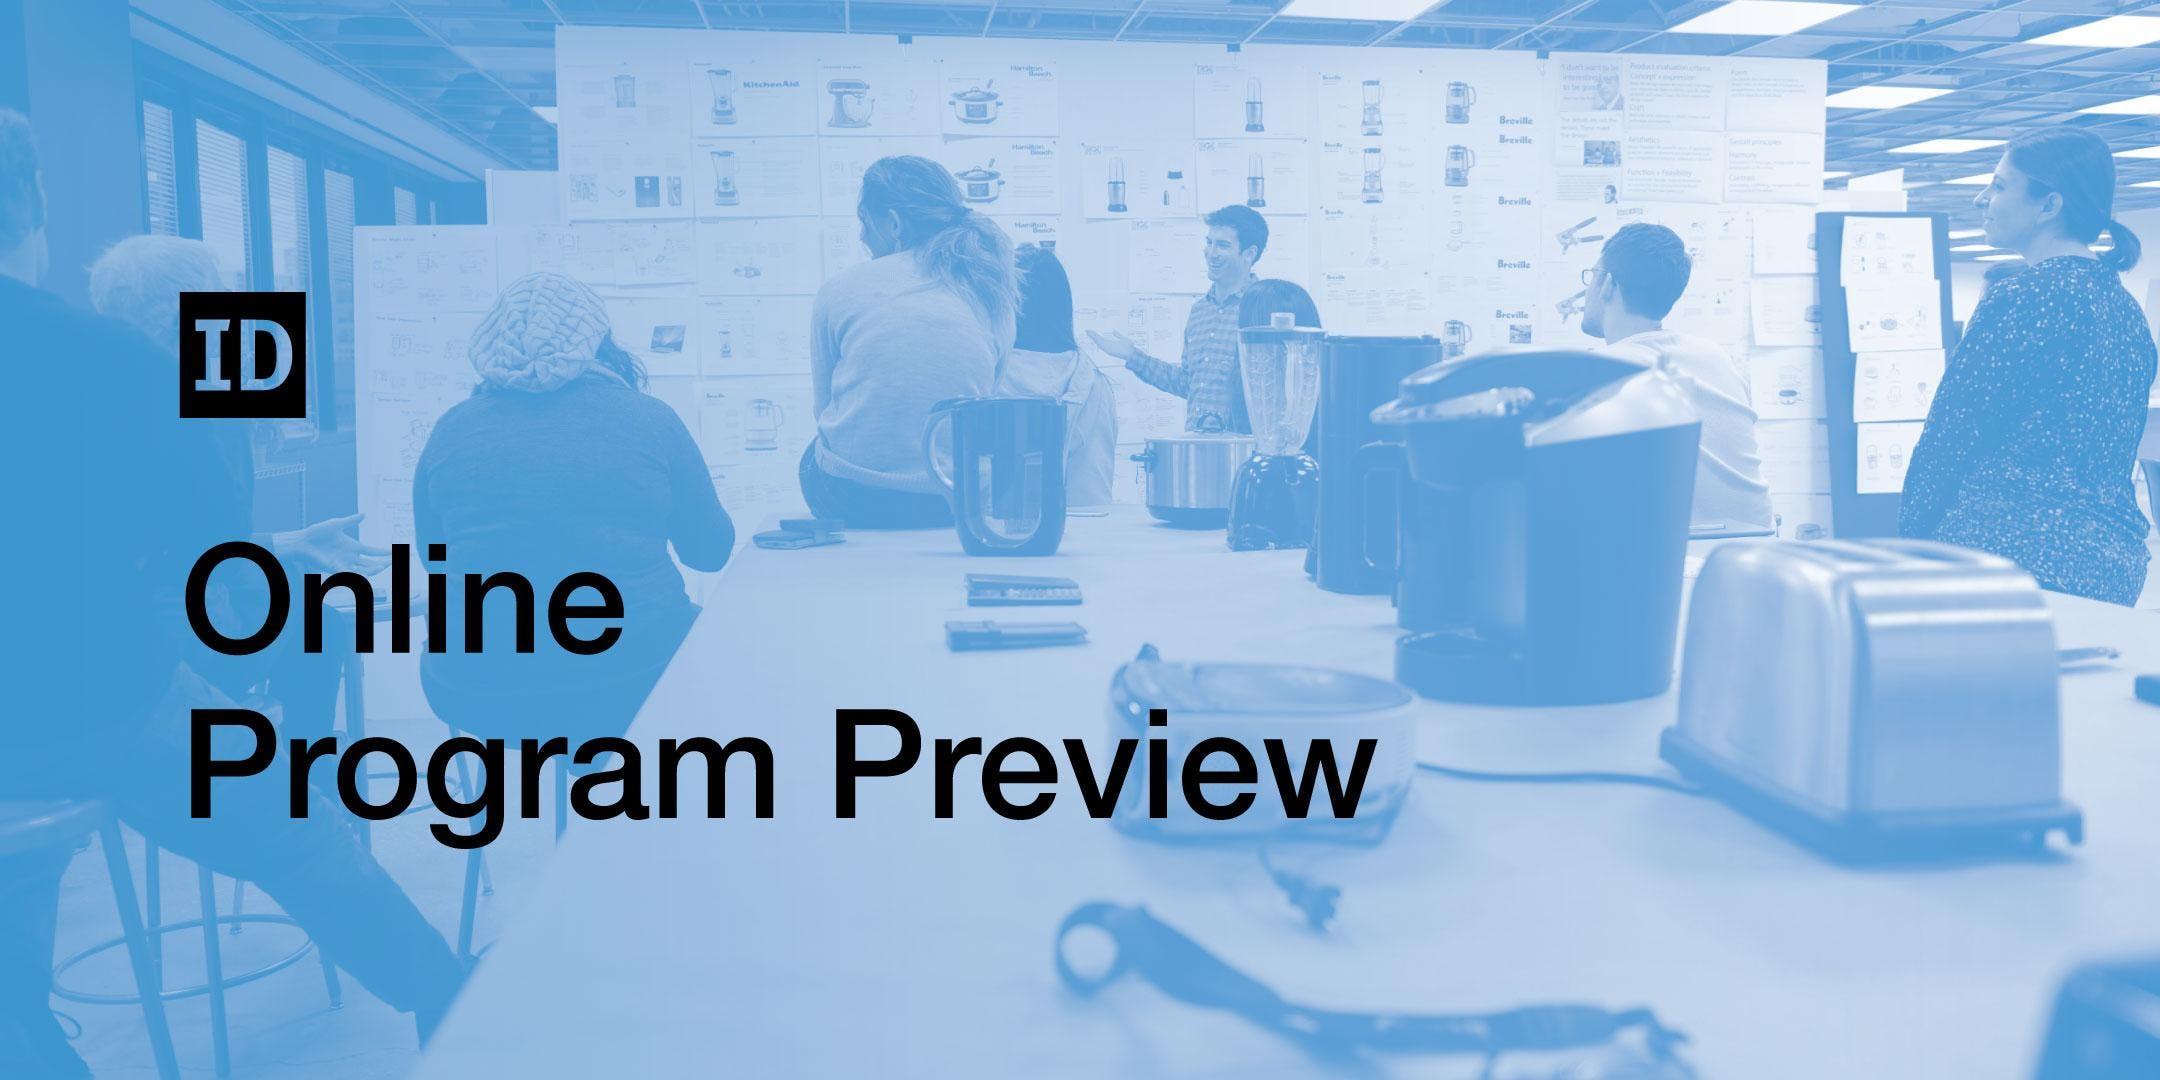 Online IIT Institute of Design Program Preview | April 5